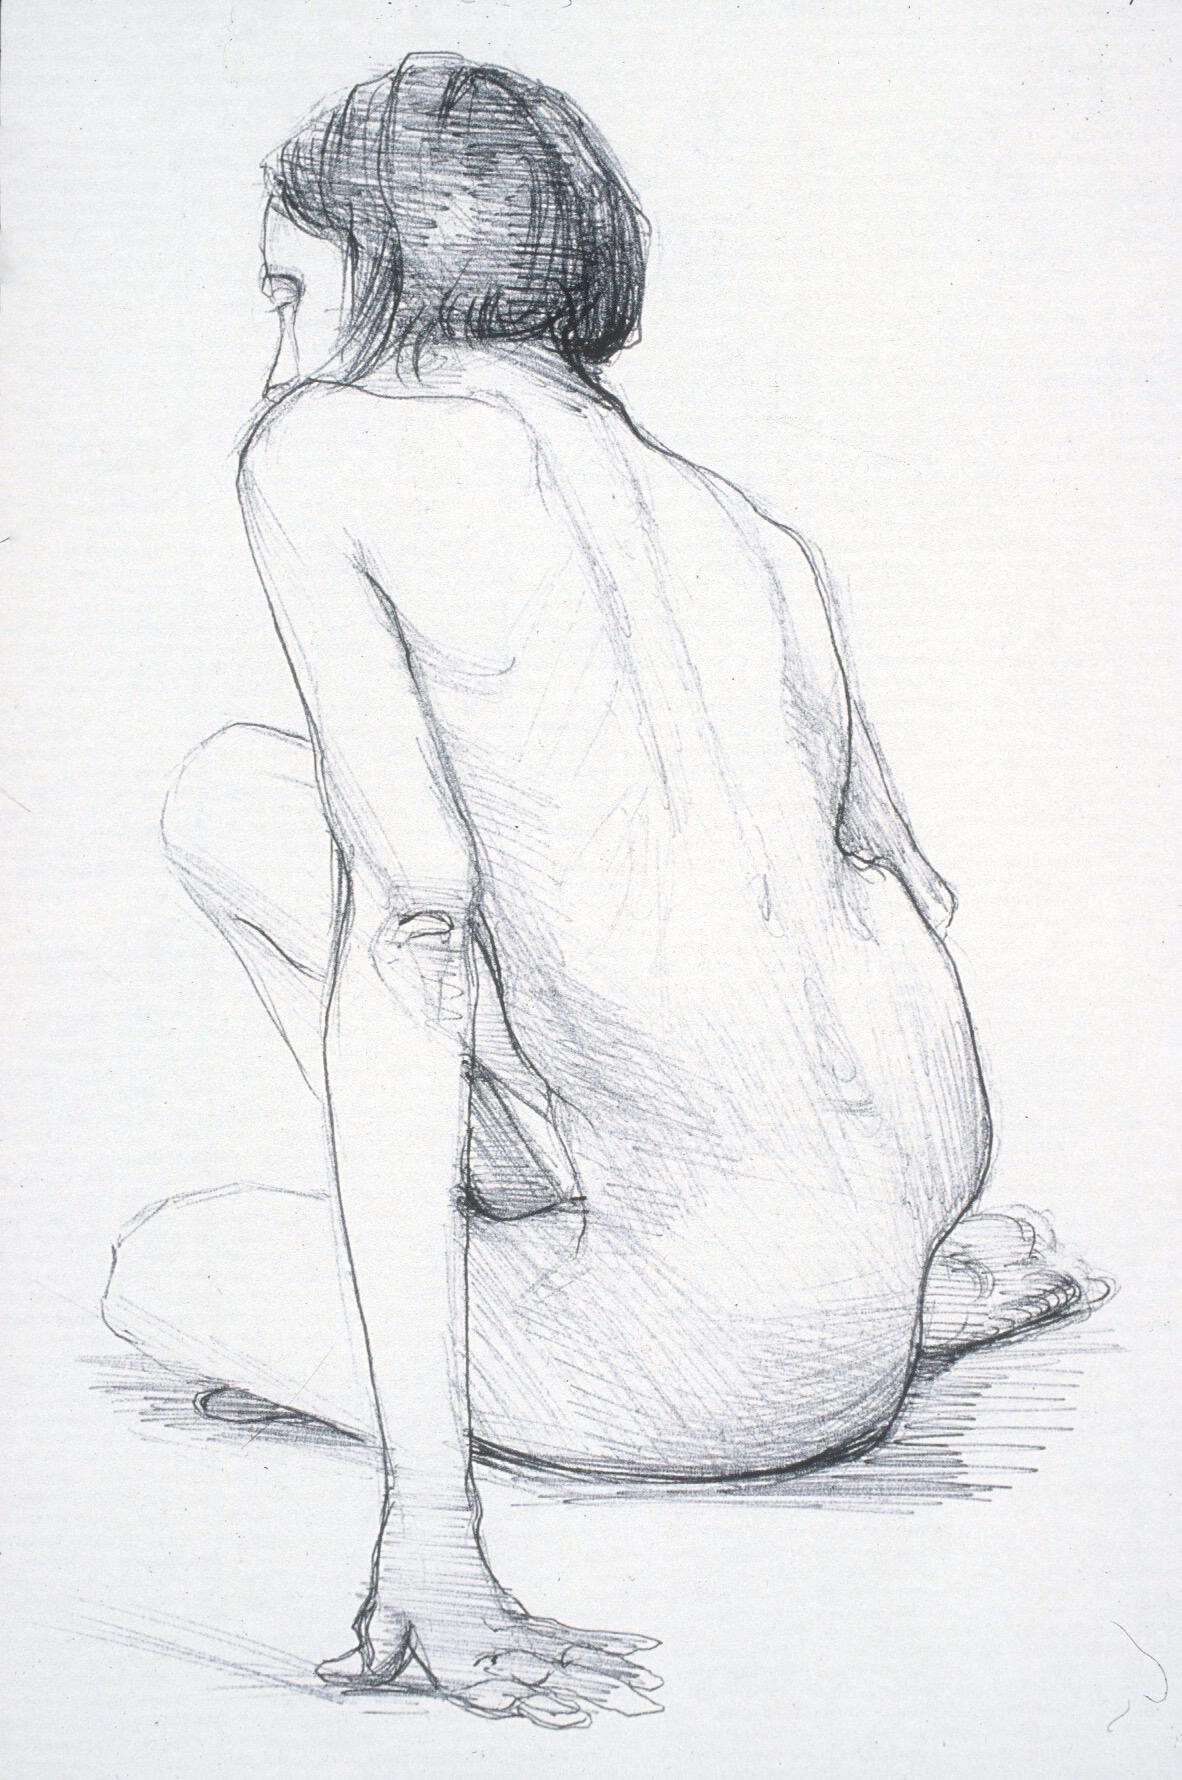 "Lou Ann Burkhardt  Cassie,   2002 Pen and ink on paper 11"" x 14"" framed"